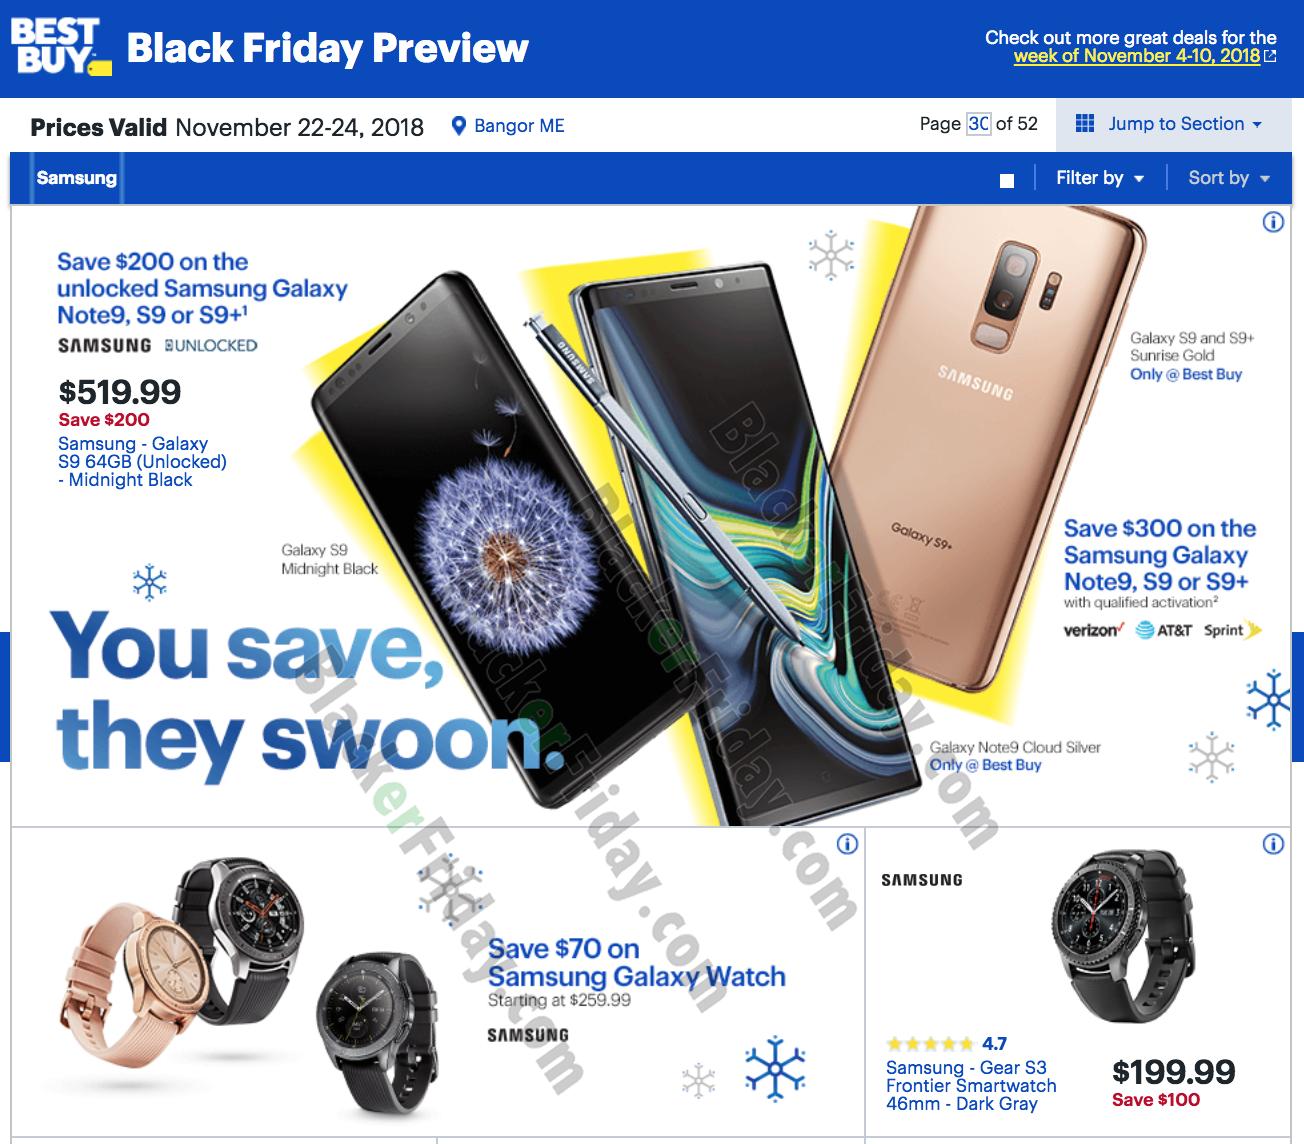 Best Buy Black Friday 2019 Ad, Sale & Deals - BlackerFriday com